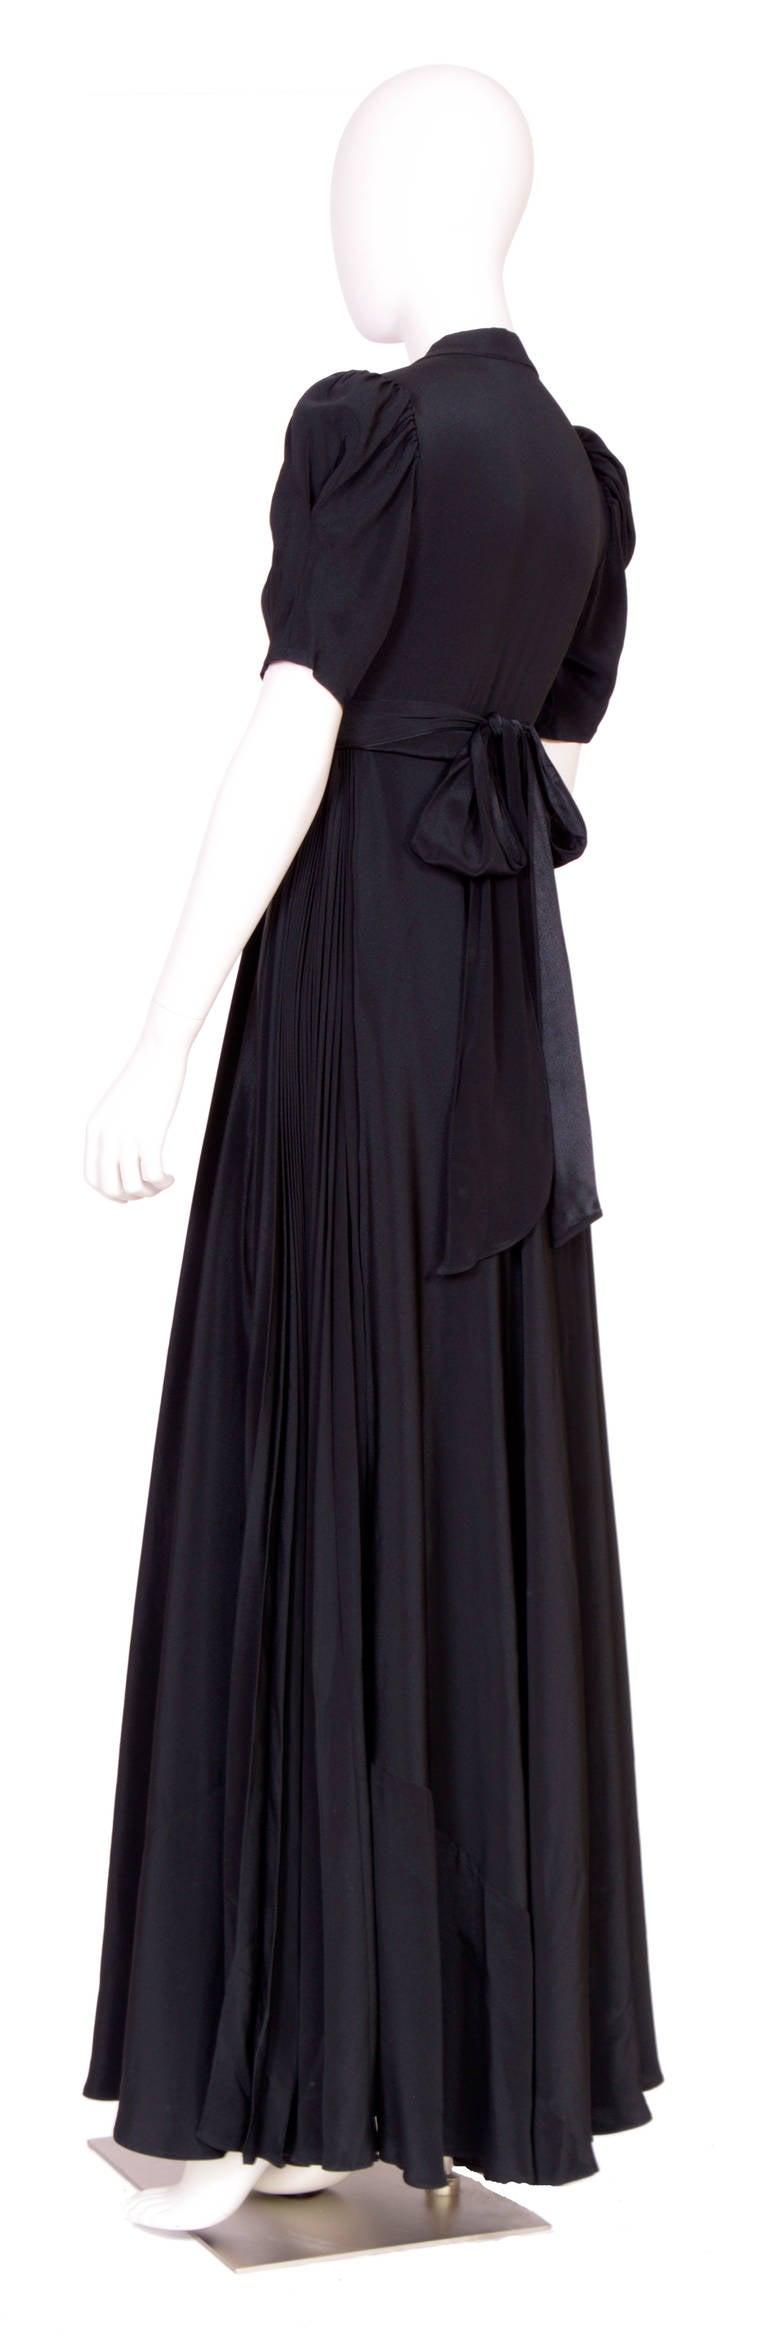 Vintage OSSIE CLARK for QUORUM Black Wrap Dress 3